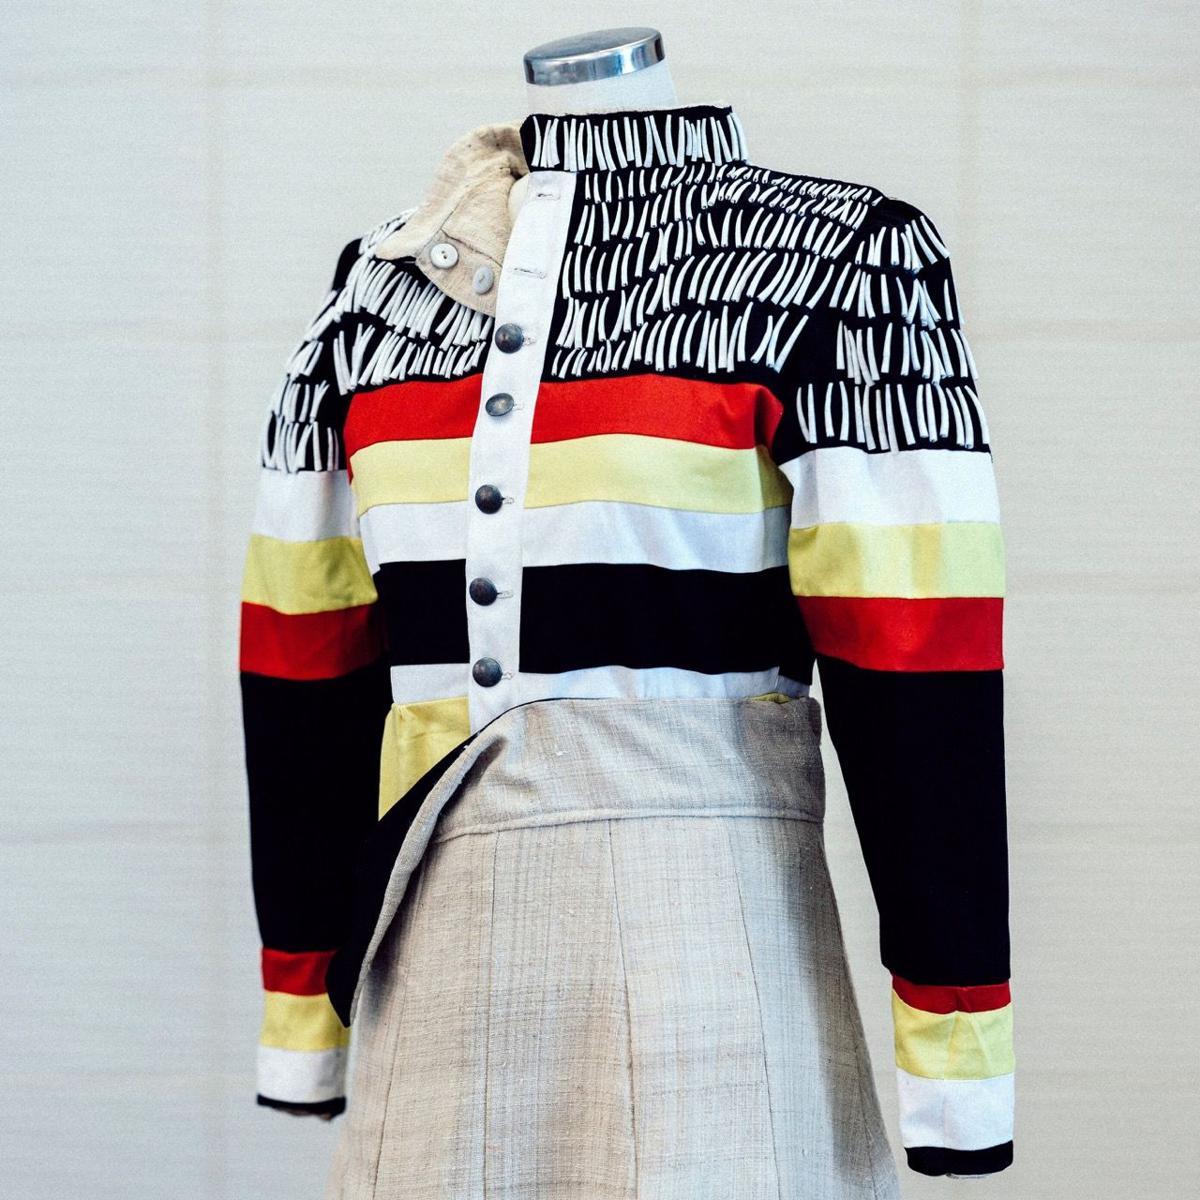 7-3 Anangookwe Elizabeth Wolf, dress 2.jpg